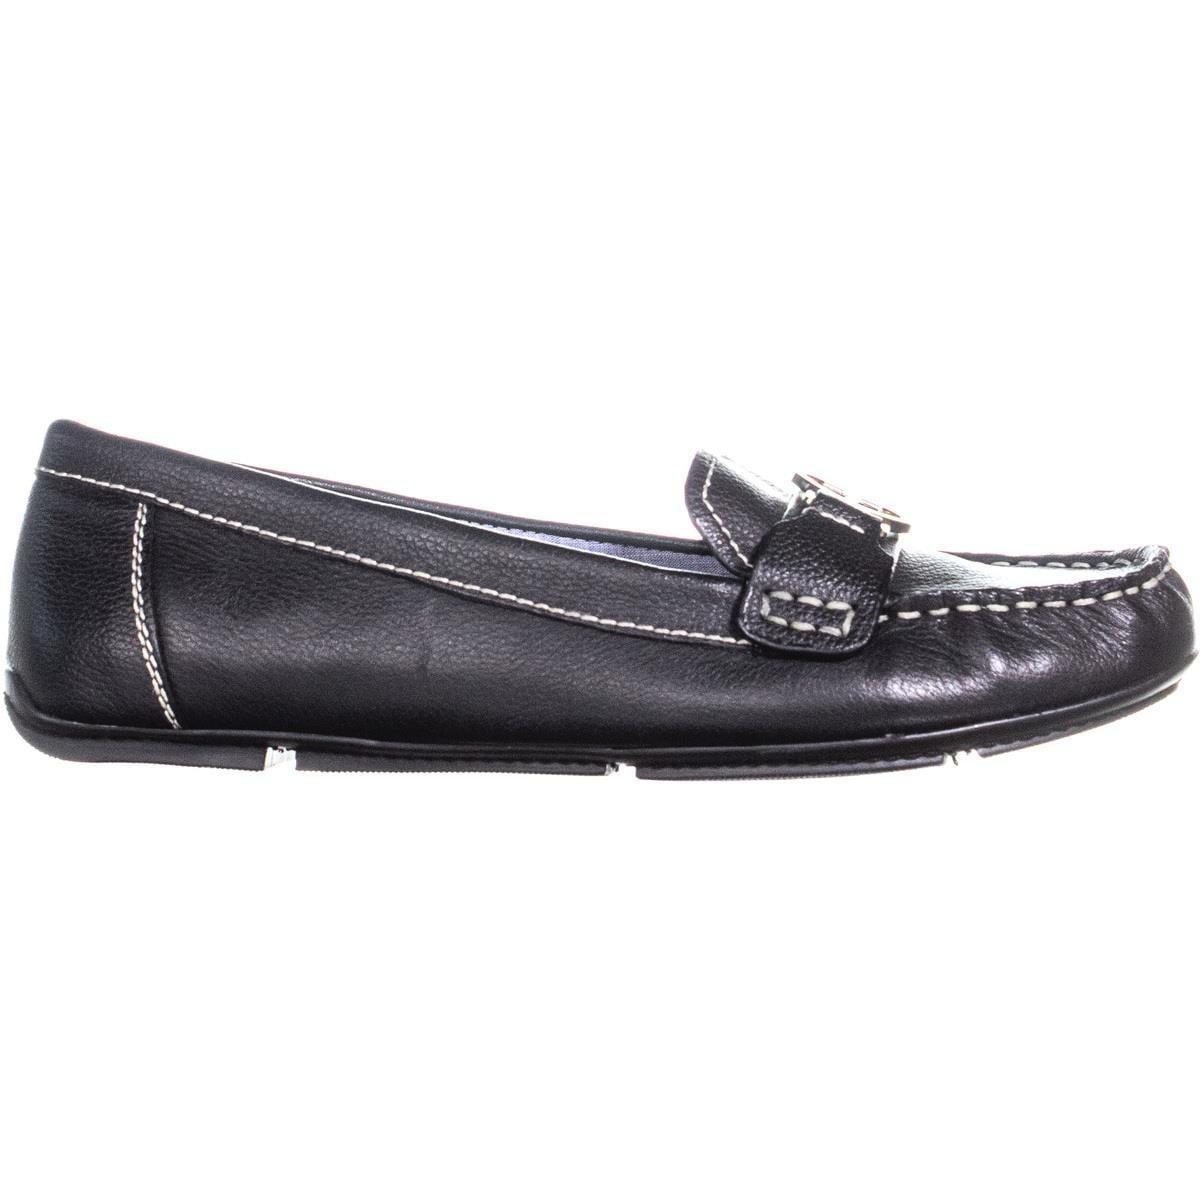 e483262dc03 Shop Tommy Hilfiger Raelyn Flat Slip On Loafers